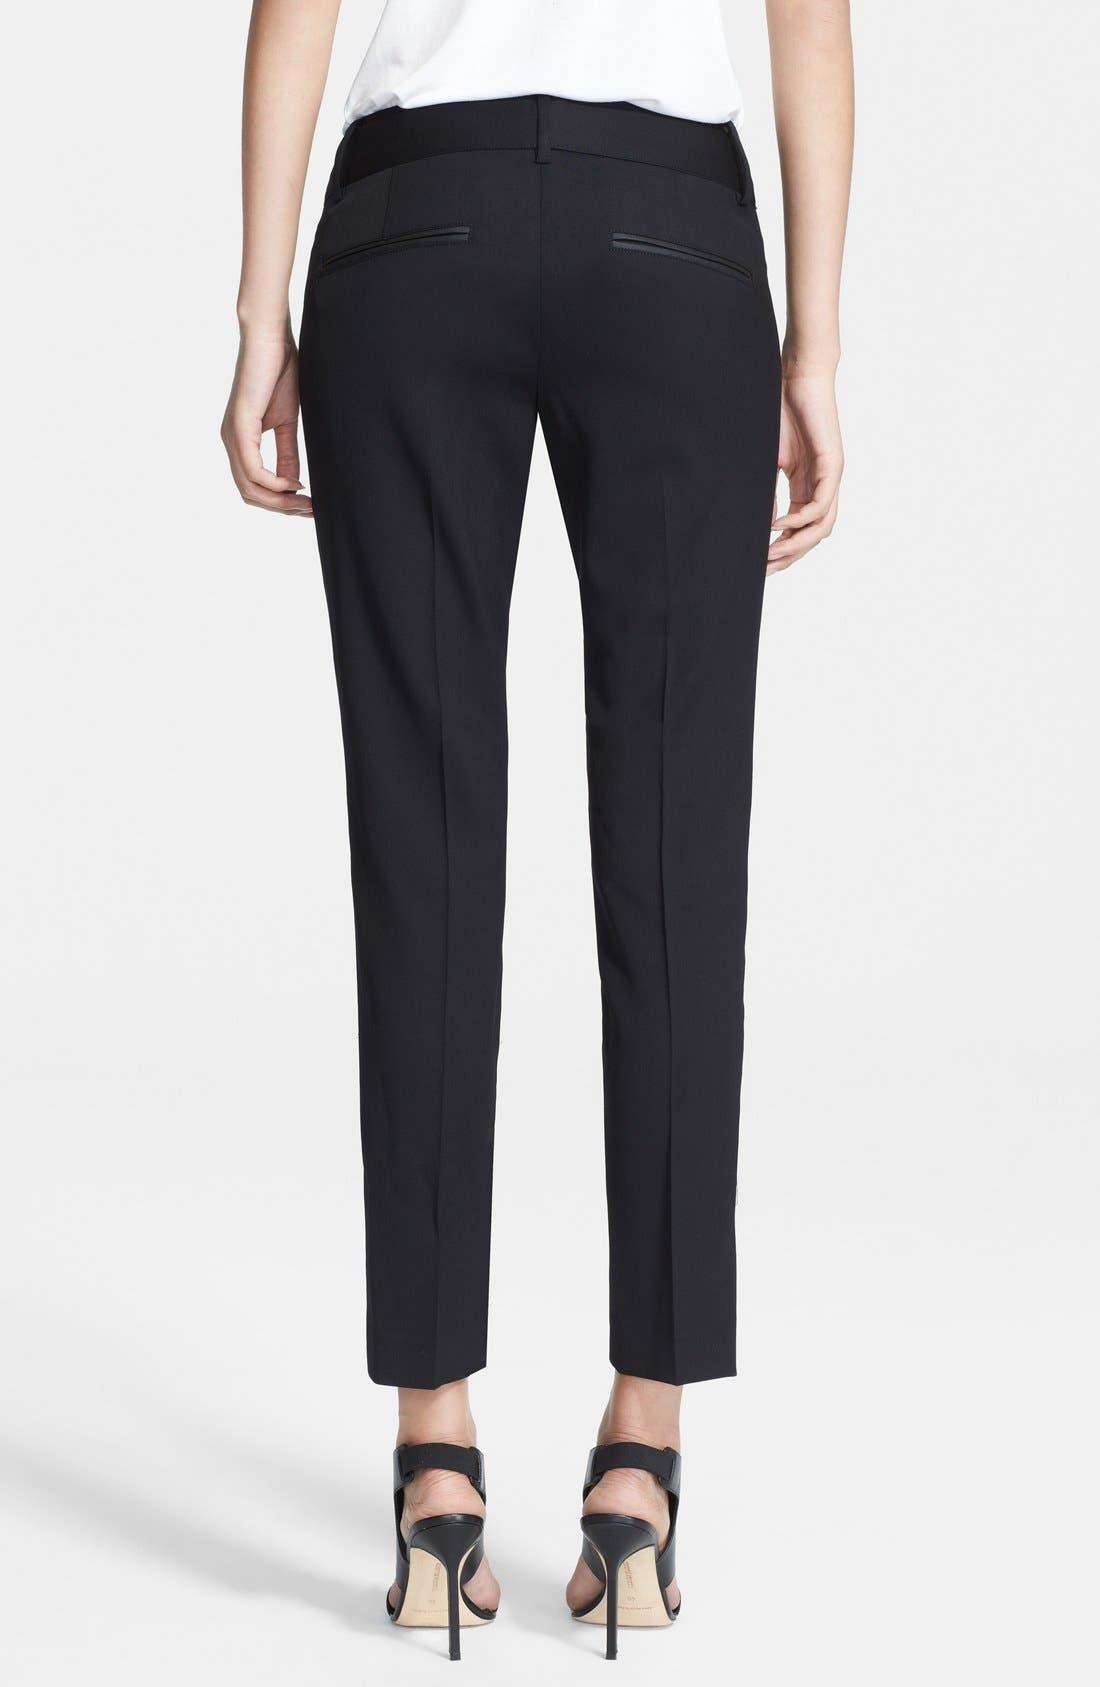 HELMUT LANG, Stretch Wool Ankle Pants, Alternate thumbnail 3, color, BLACK